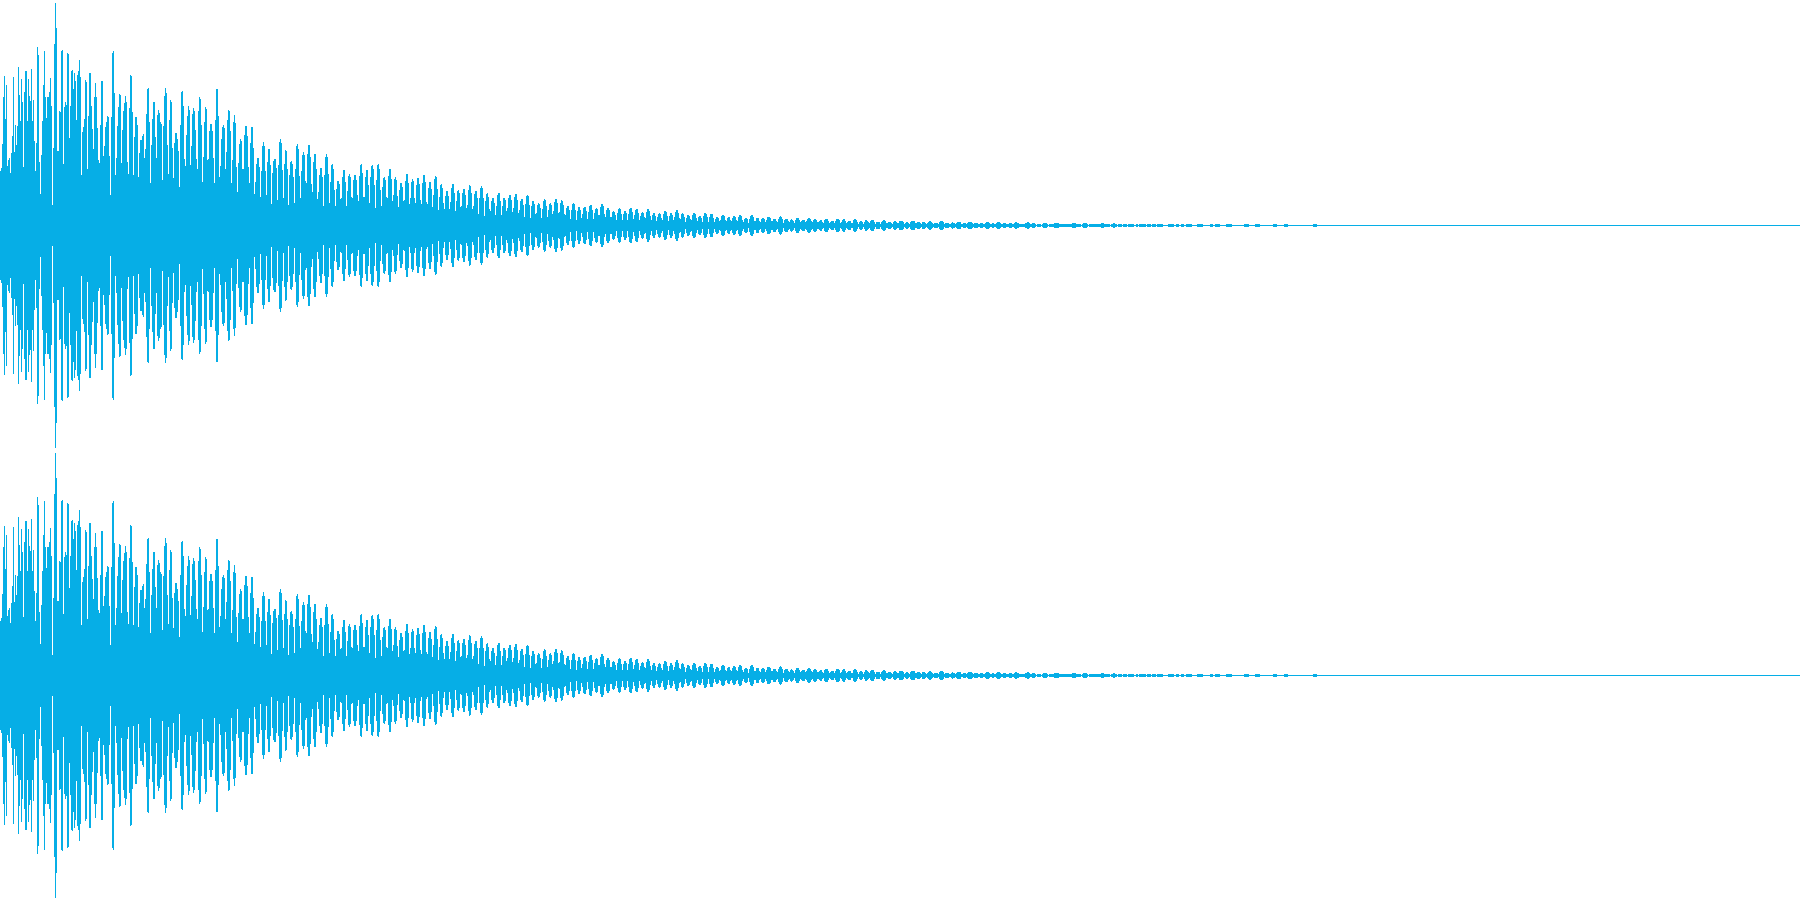 DTM Tom 14 オリジナル音源の再生済みの波形